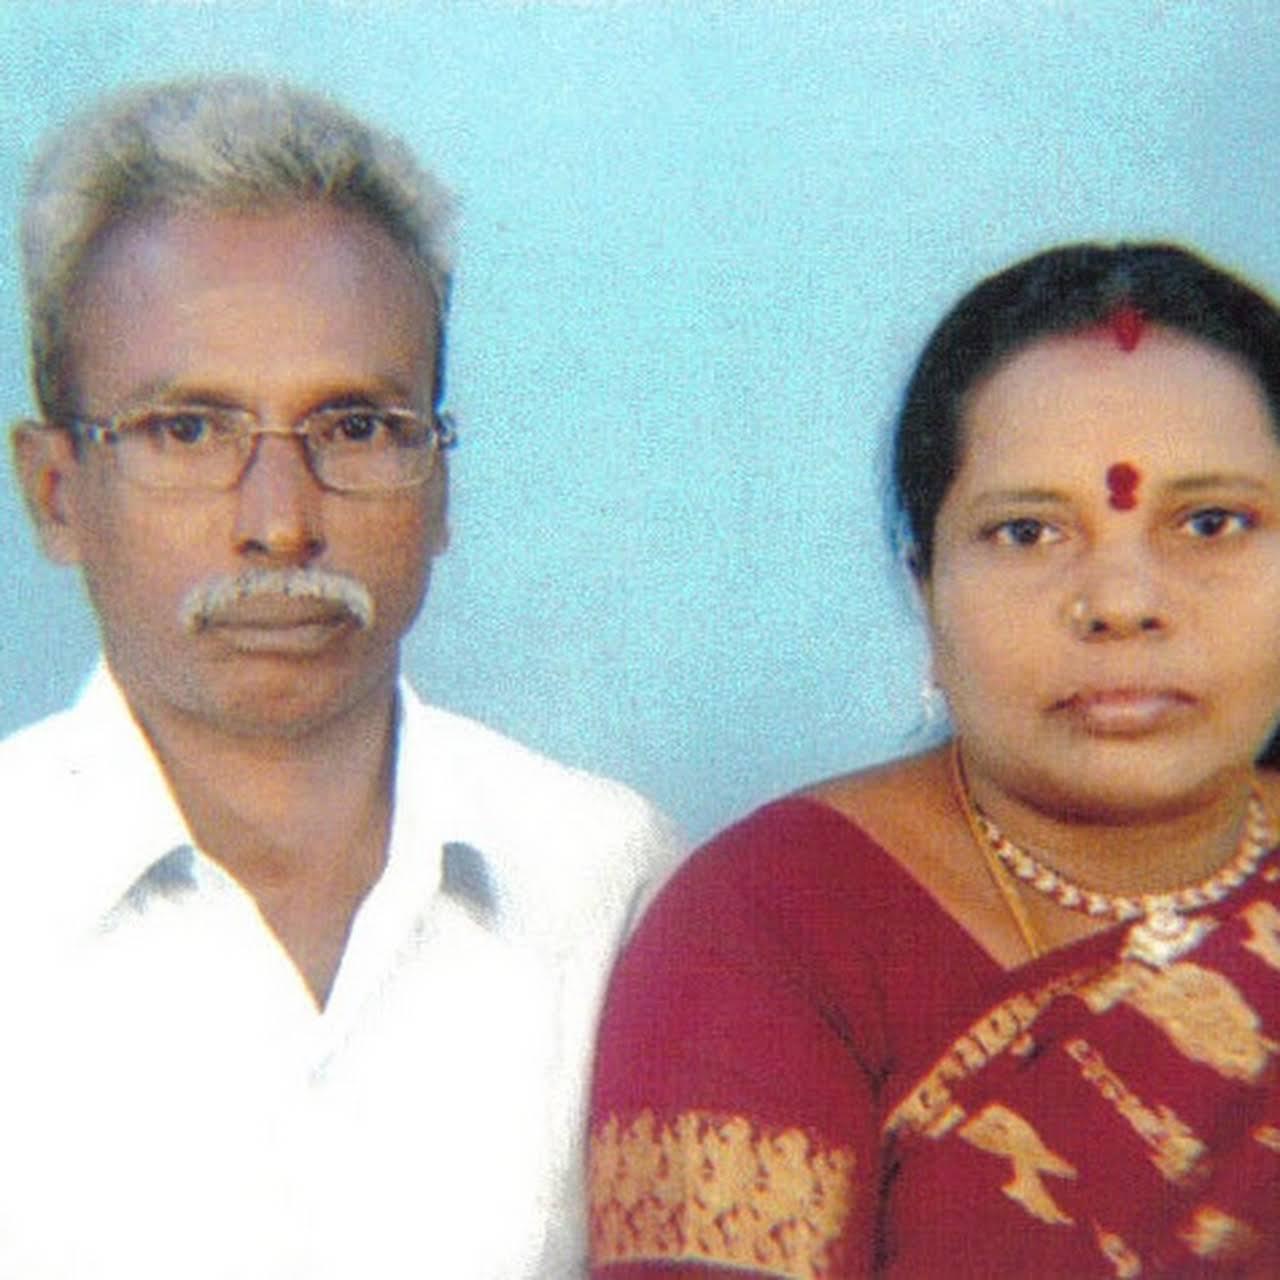 srimathimatrimonial com - Marriage Registry Office in Avadi